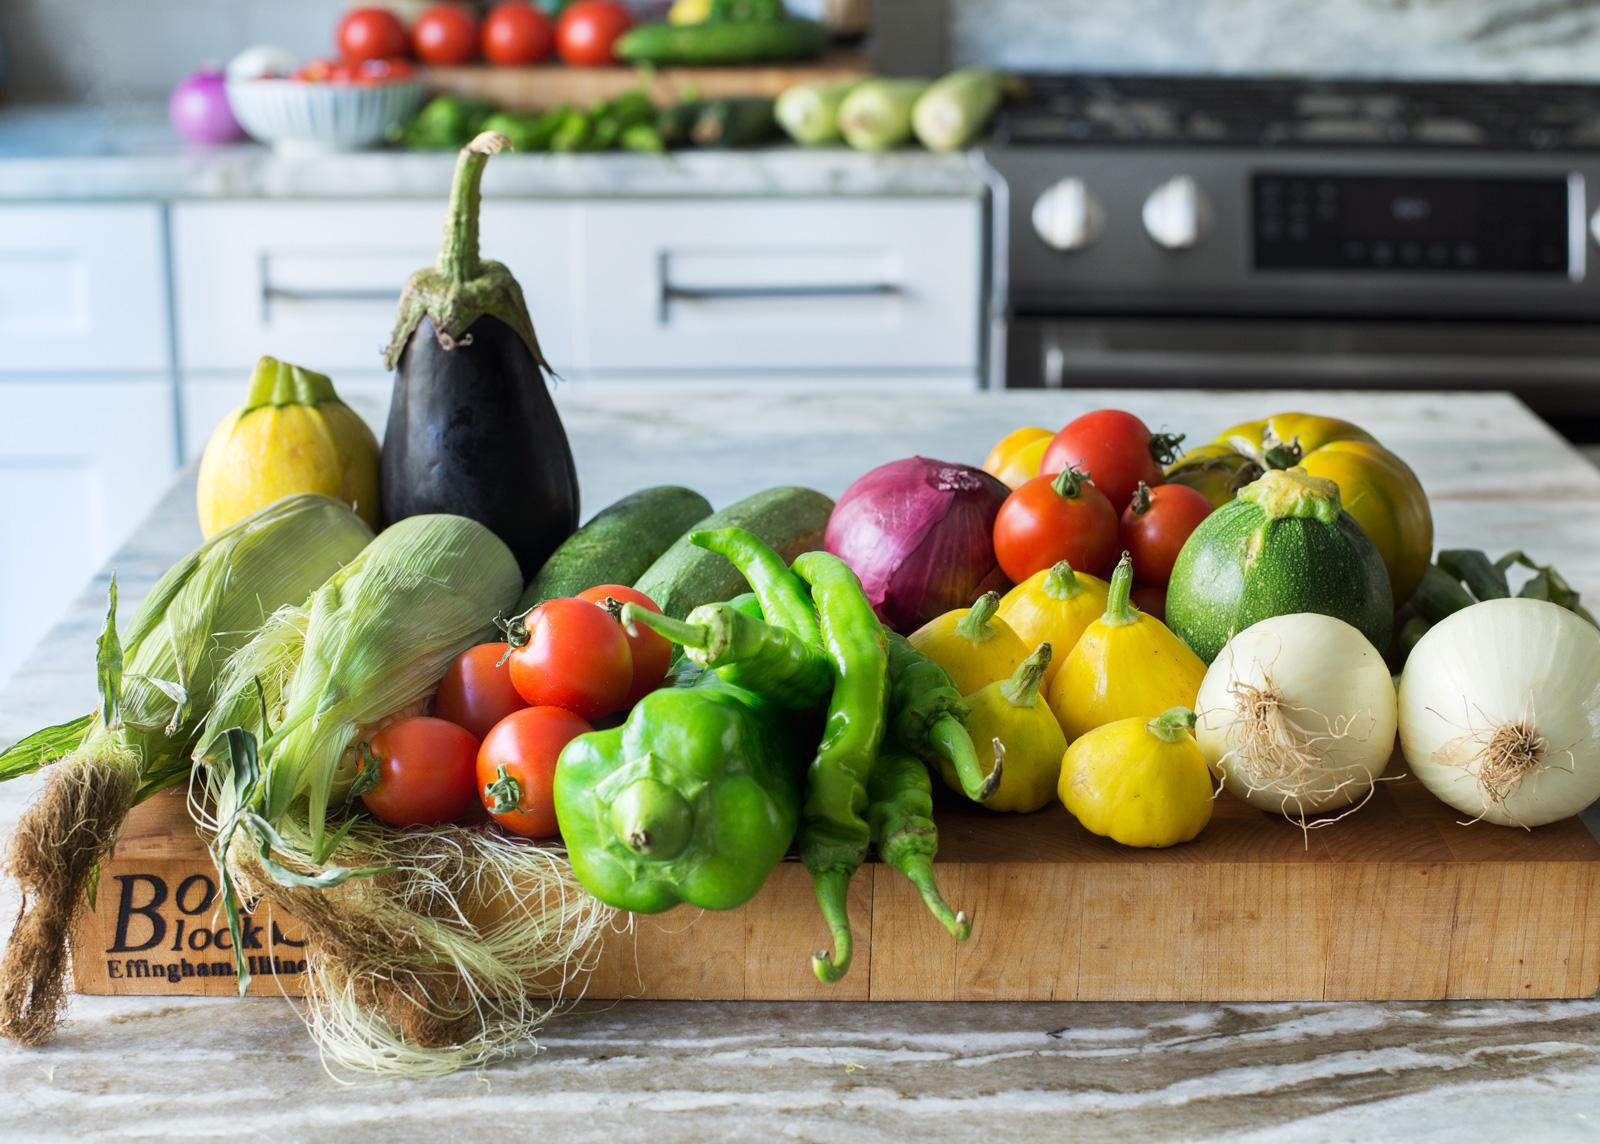 multicolored-veggies-on-a-cutting-board